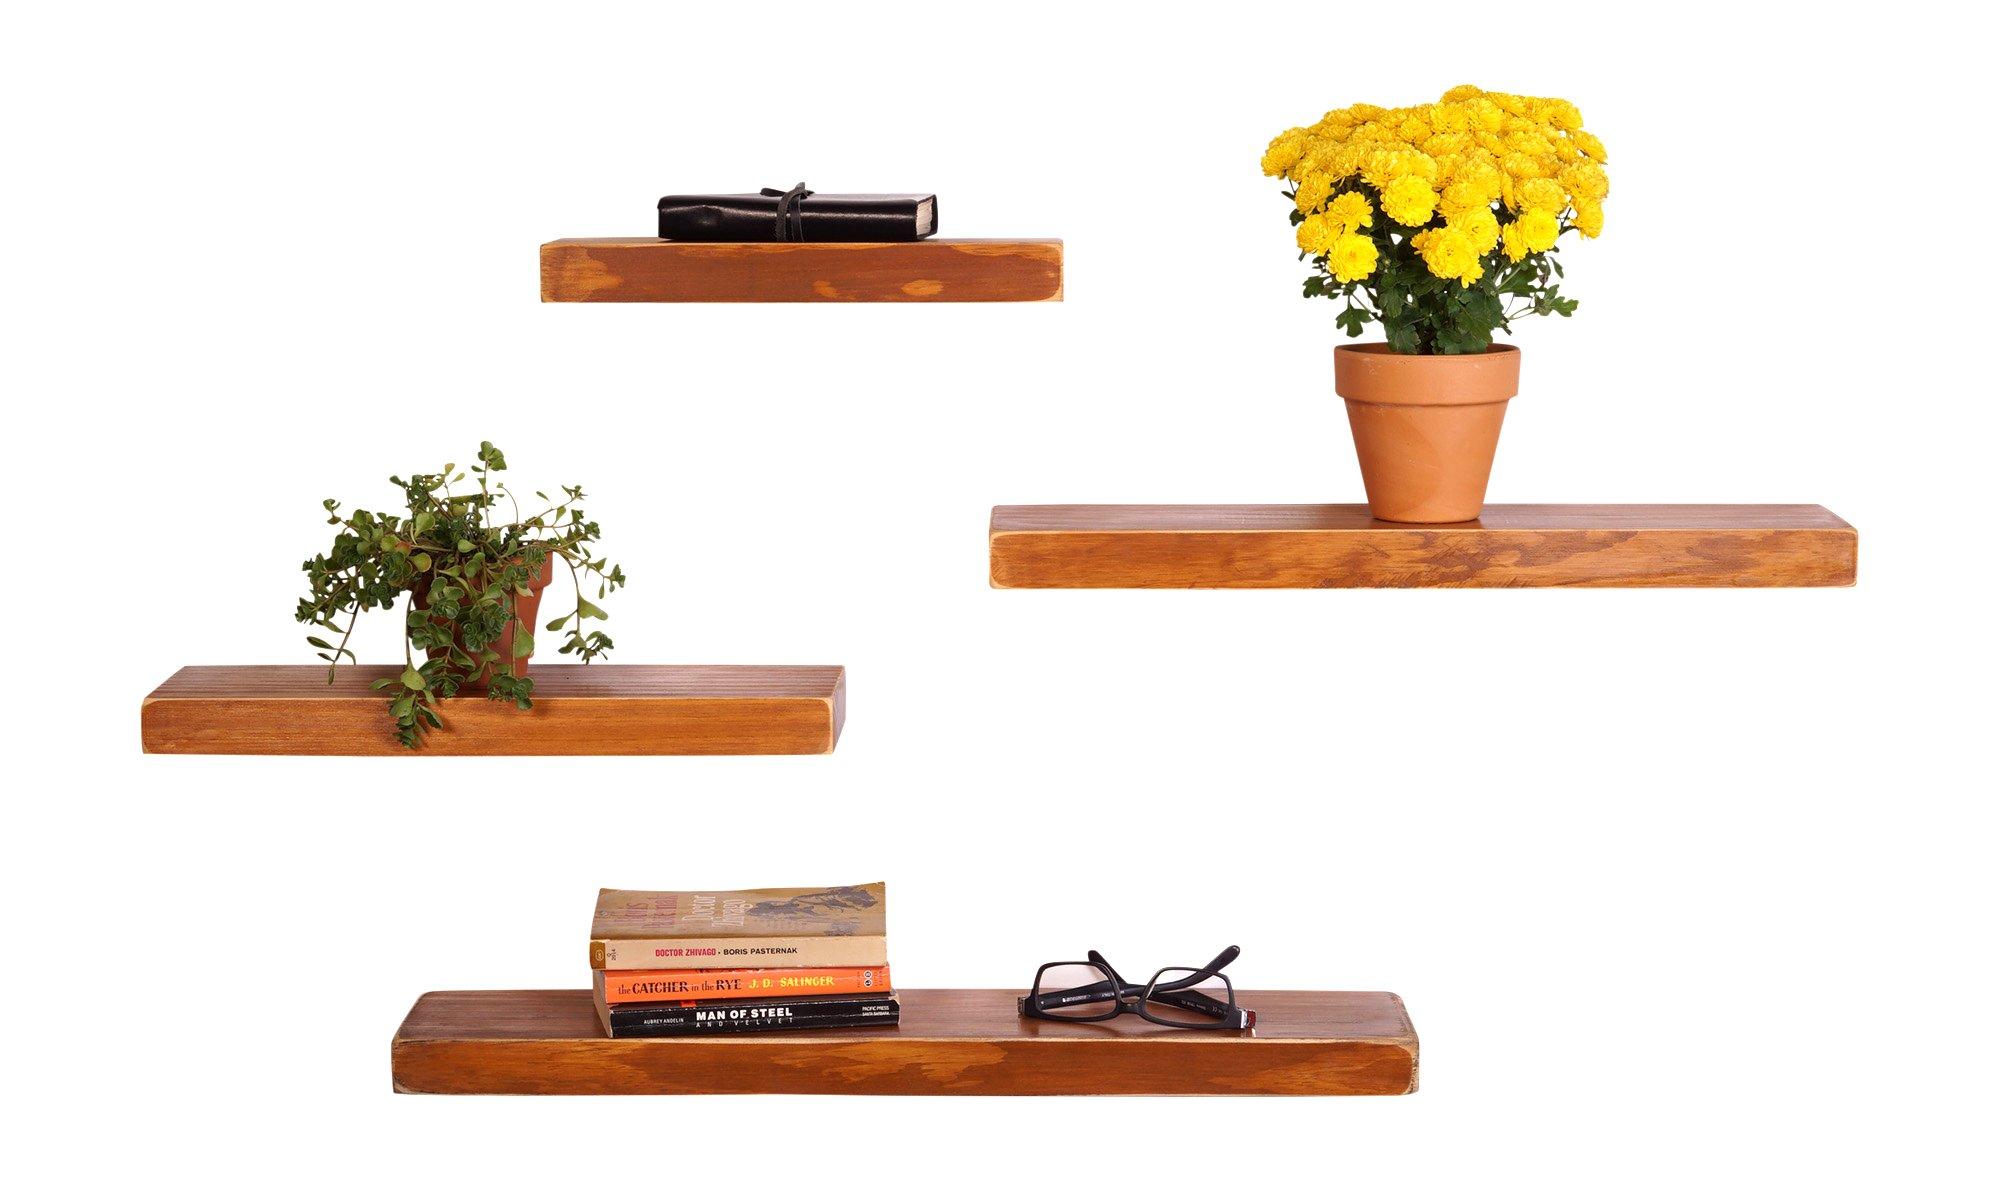 DAKODA LOVE Weathered Edge Floating Shelves, USA Handmade, Clear Coat Finish, 100% Countersunk Hidden Floating Shelf Brackets, Beautiful Grain Pine Wood Rustic Wall Decor (Set of 4) (Autumn)